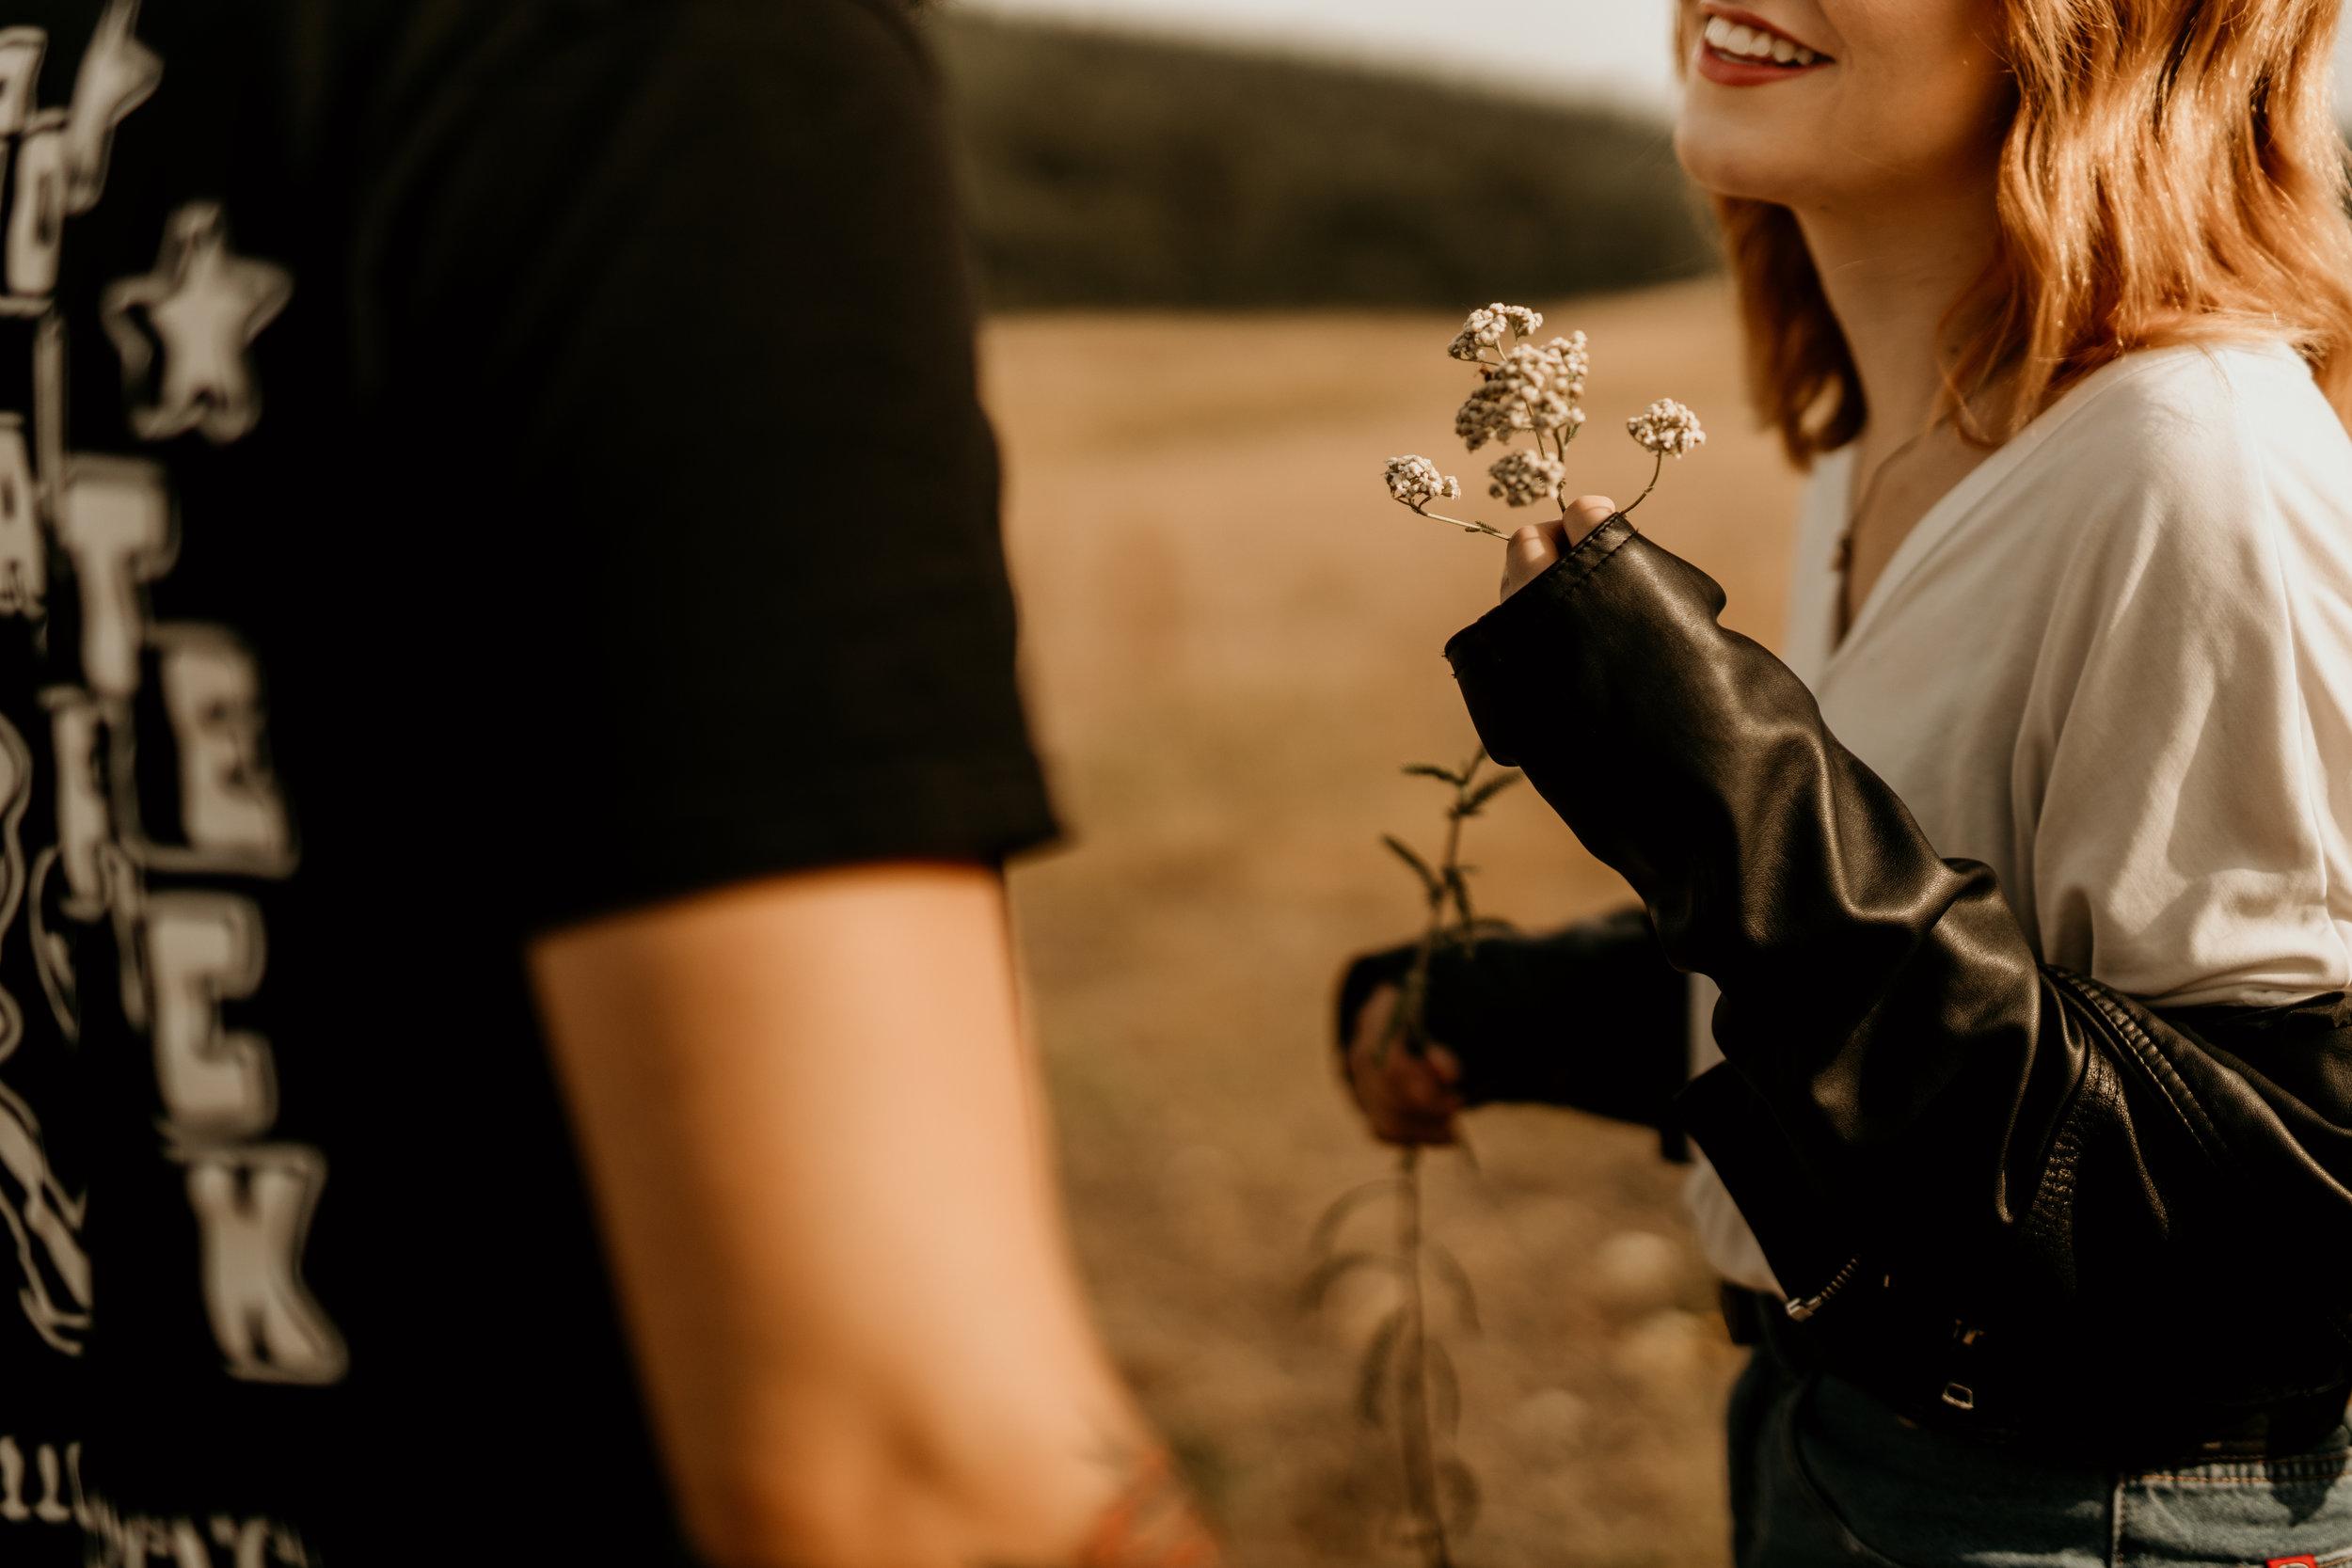 couples-engagement-outdoor-tatoo-photoshoot-little-rock-arkansas-9107.jpg